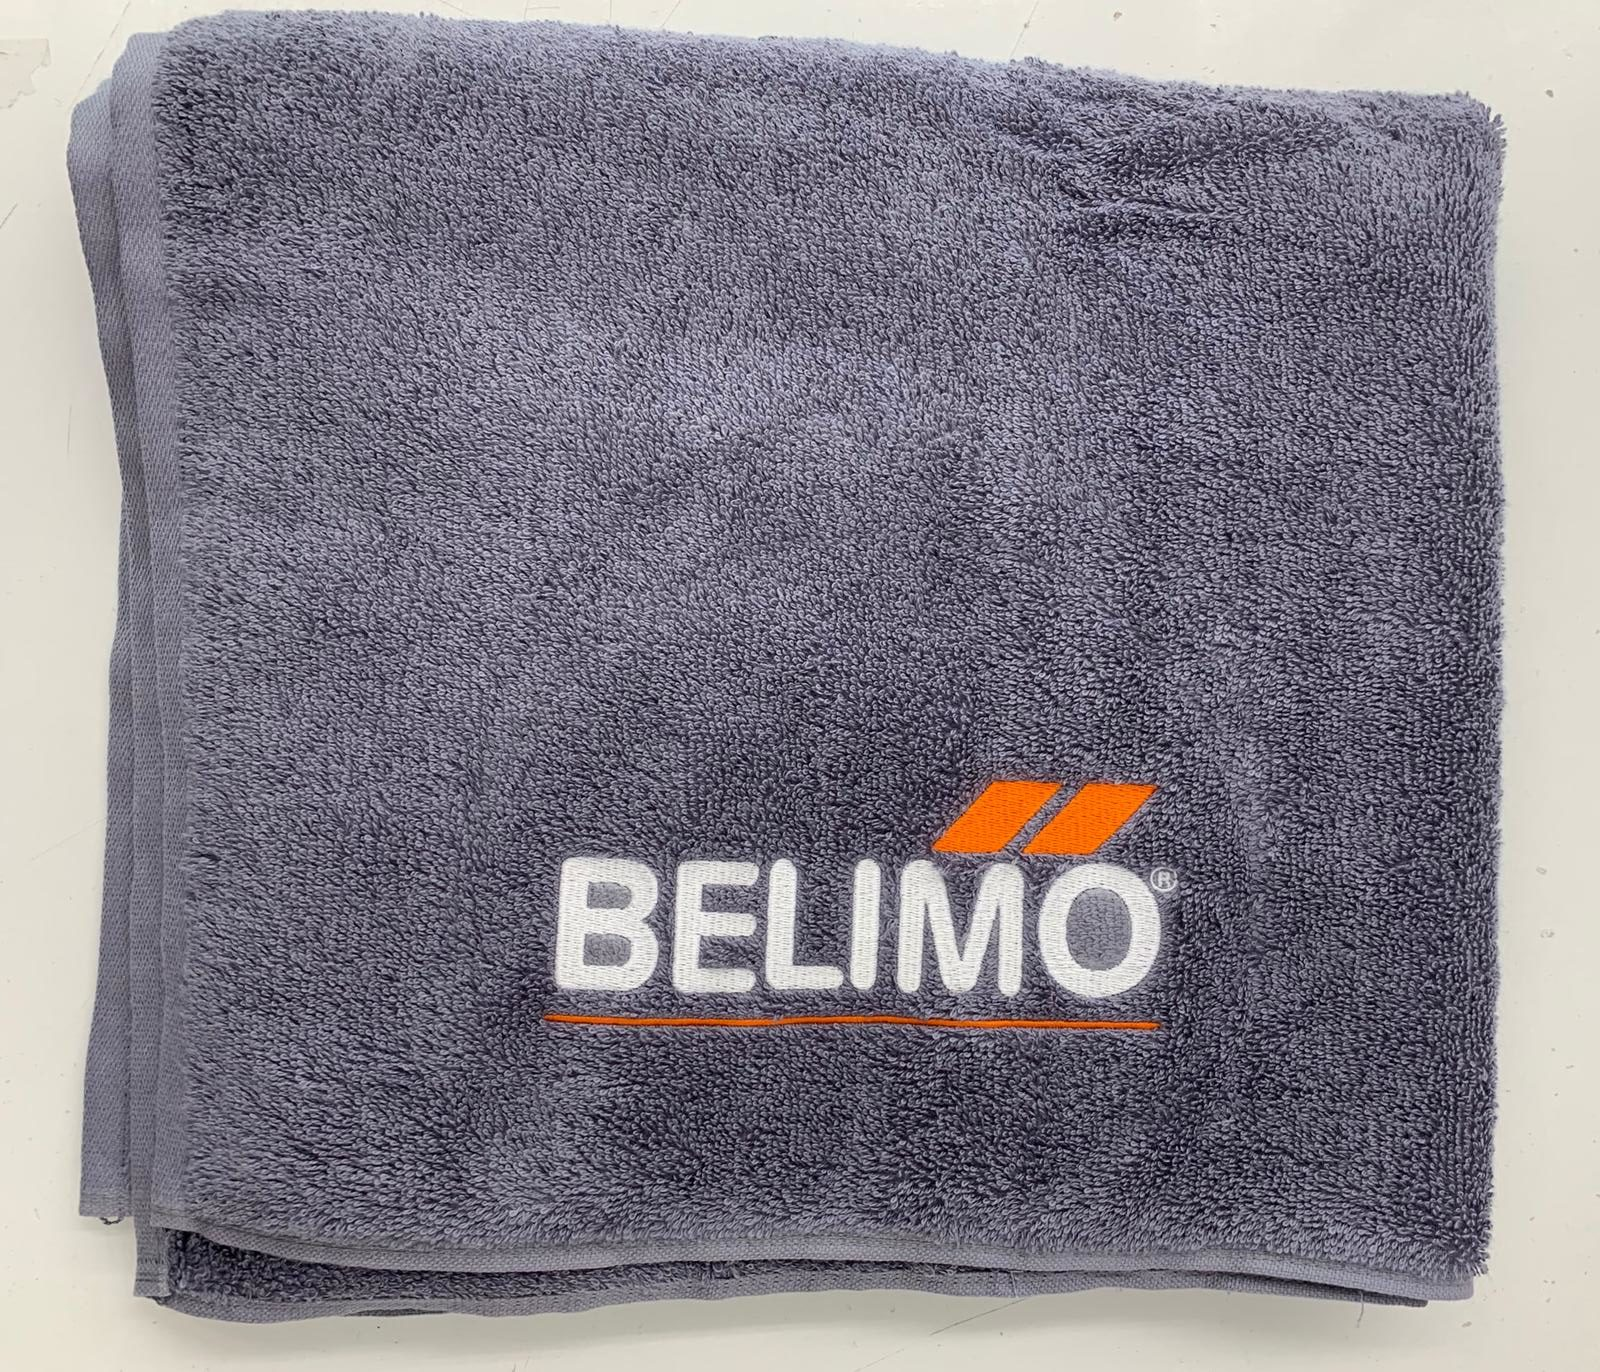 Belimo_Badetuch_gestickt